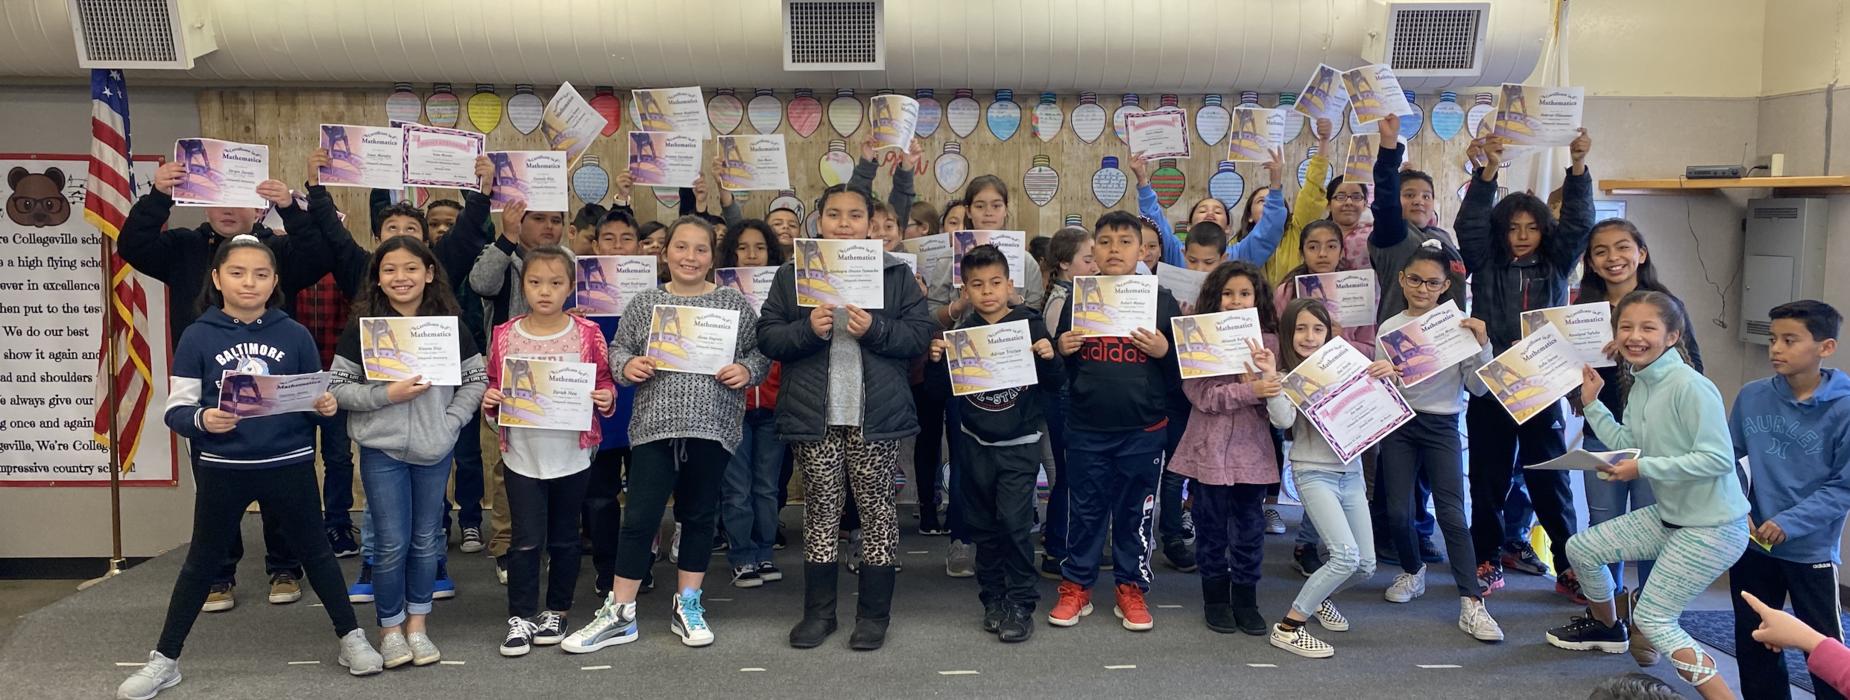 Students celebrate academic achievement